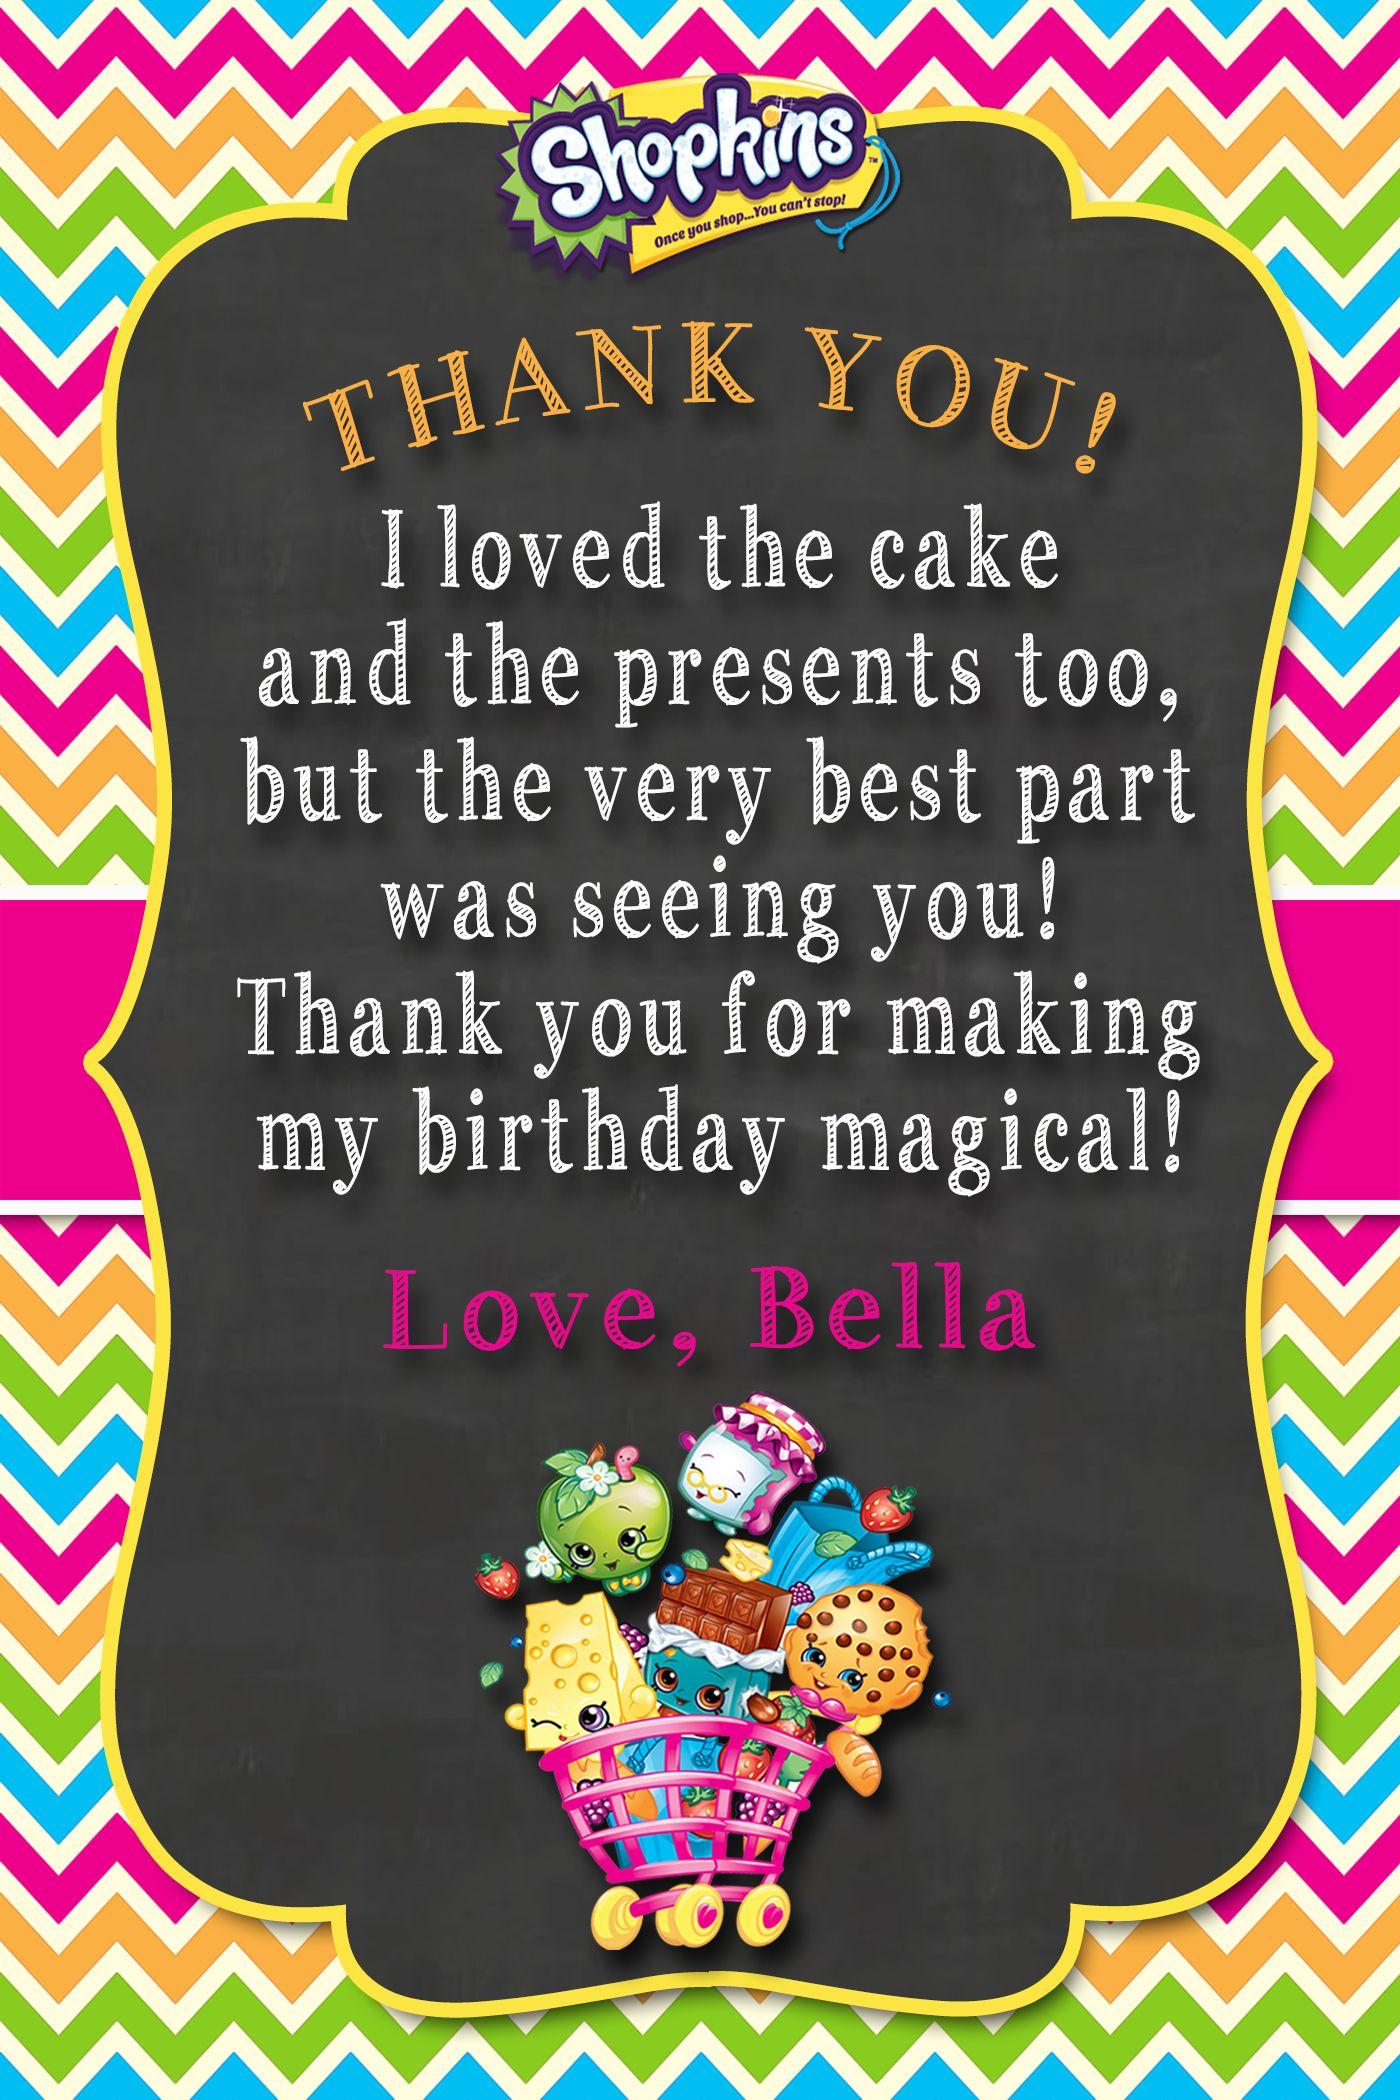 Shopkins Thank You Card   Shopkins 4 My Bianca! In 2019   Shopkins - Free Printable Shopkins Thank You Cards